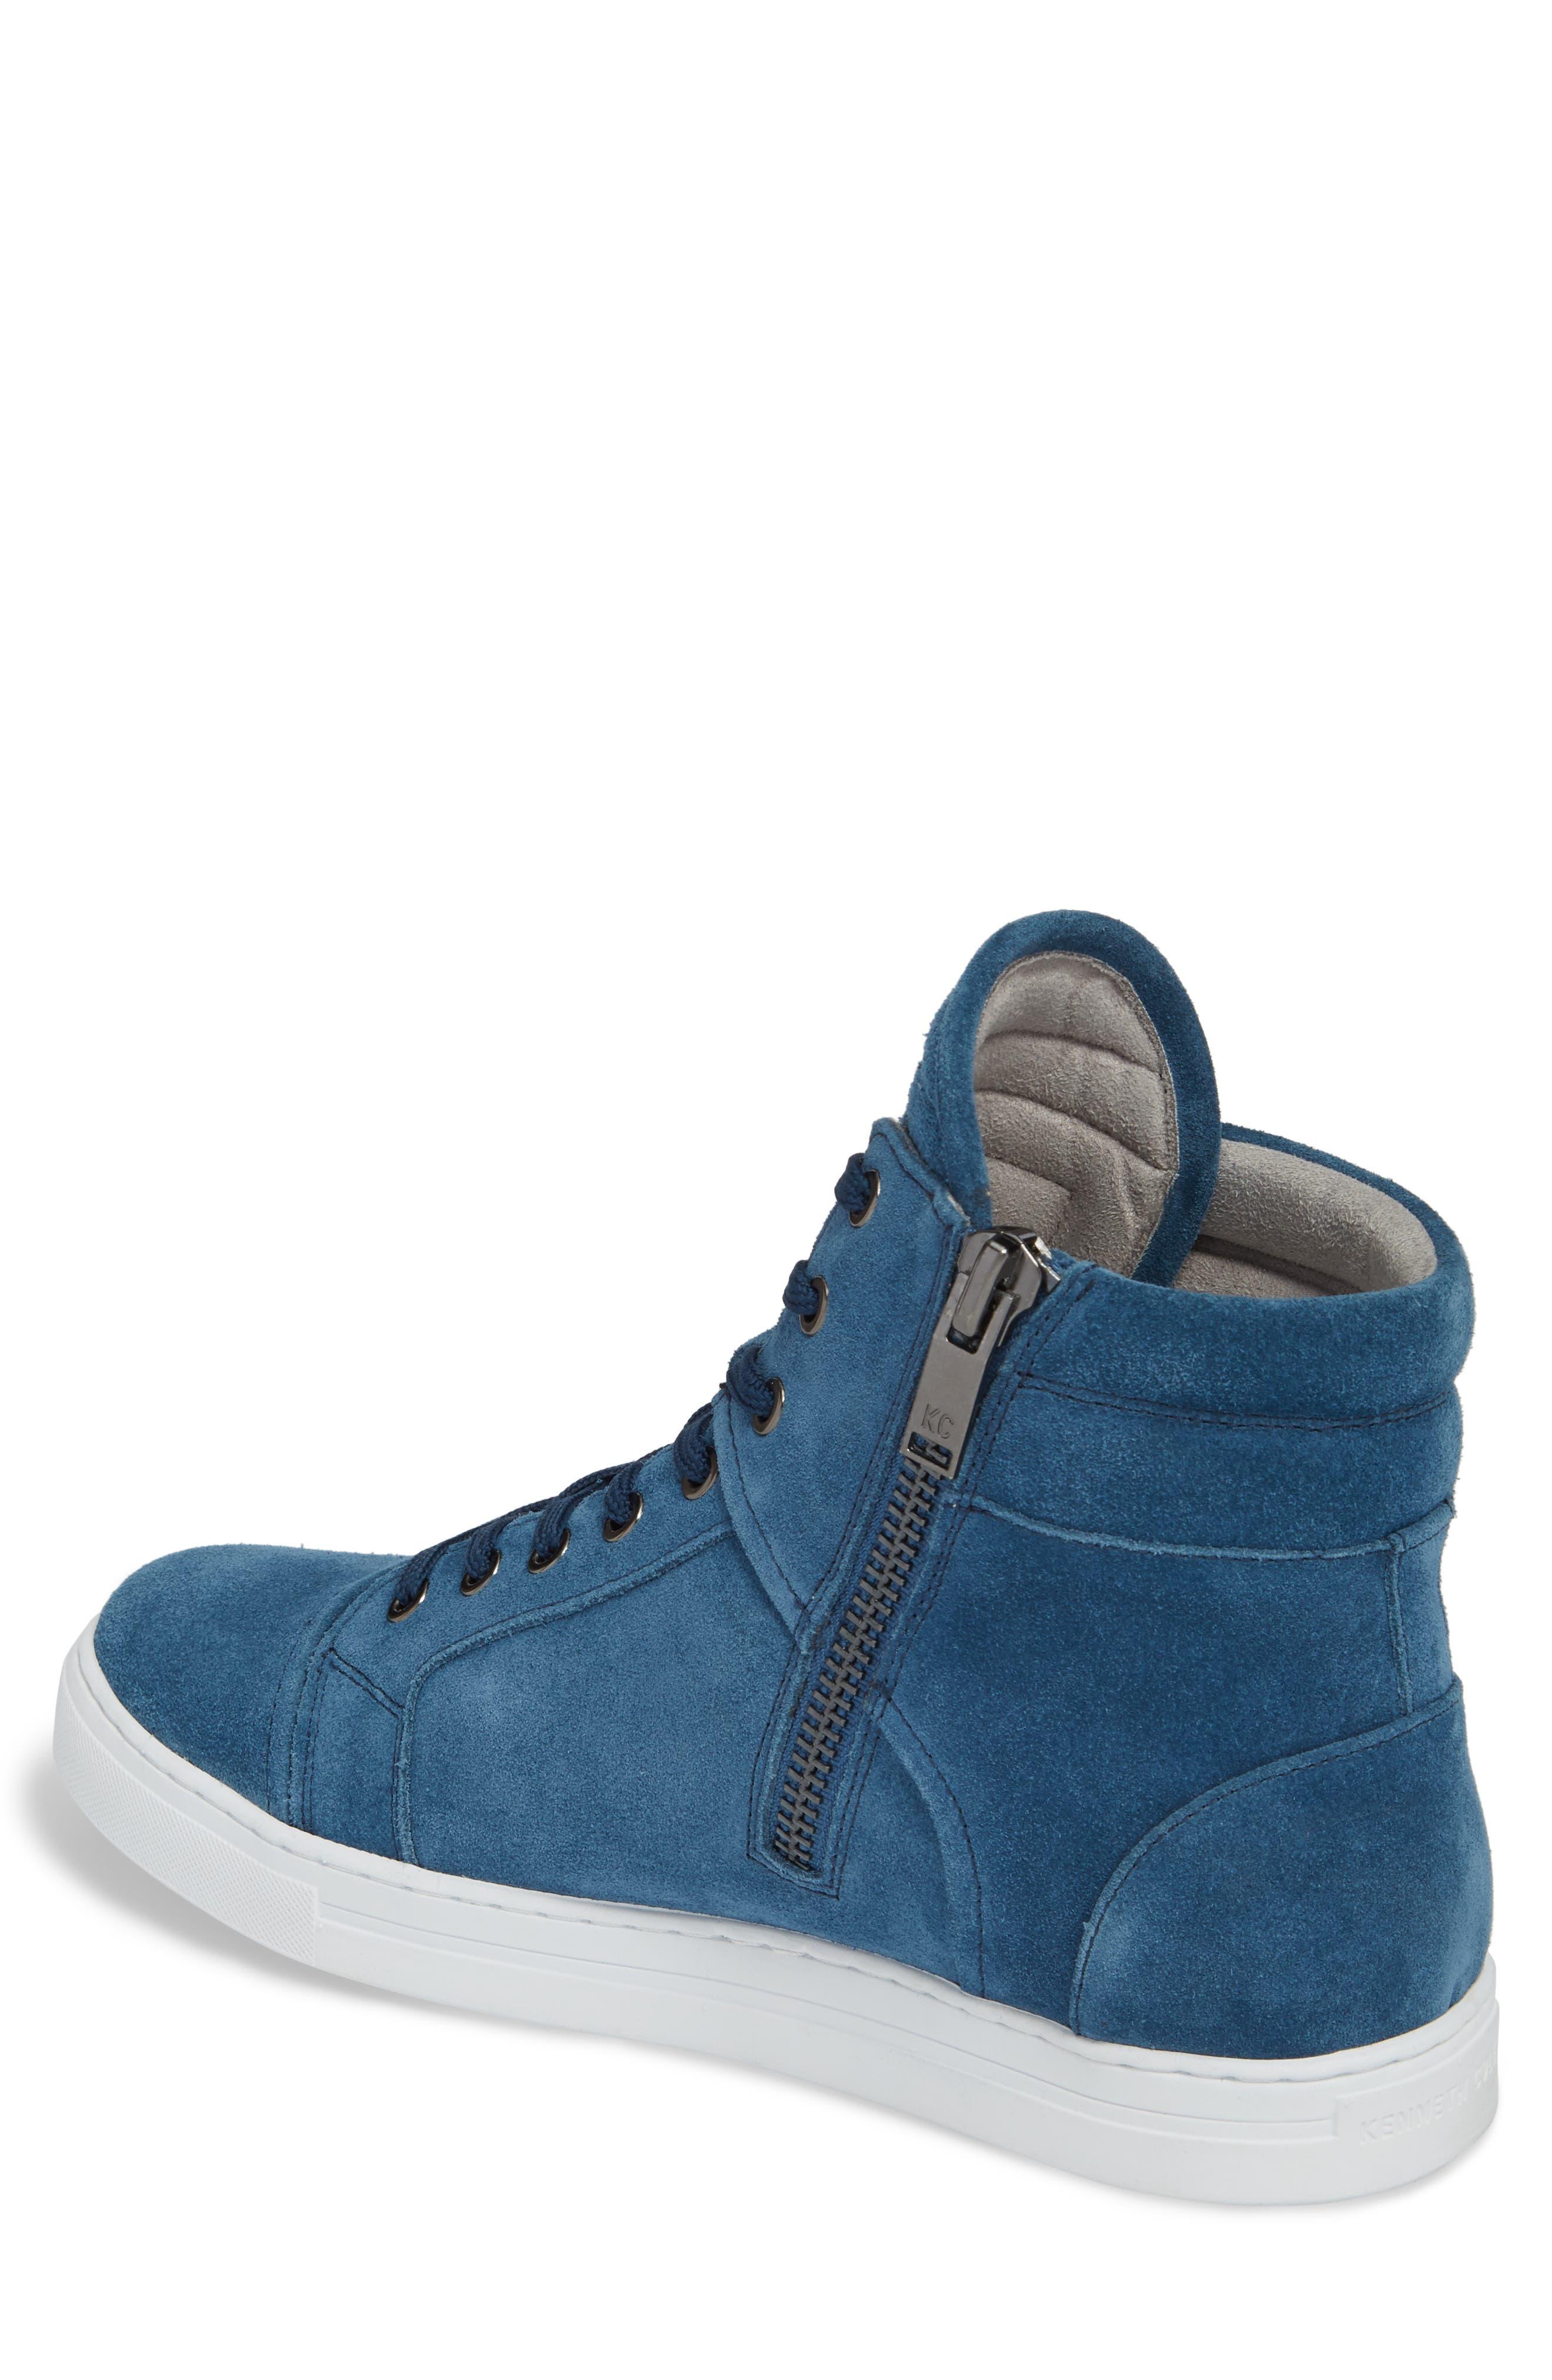 Double Header Sneaker,                             Alternate thumbnail 2, color,                             Blue Suede